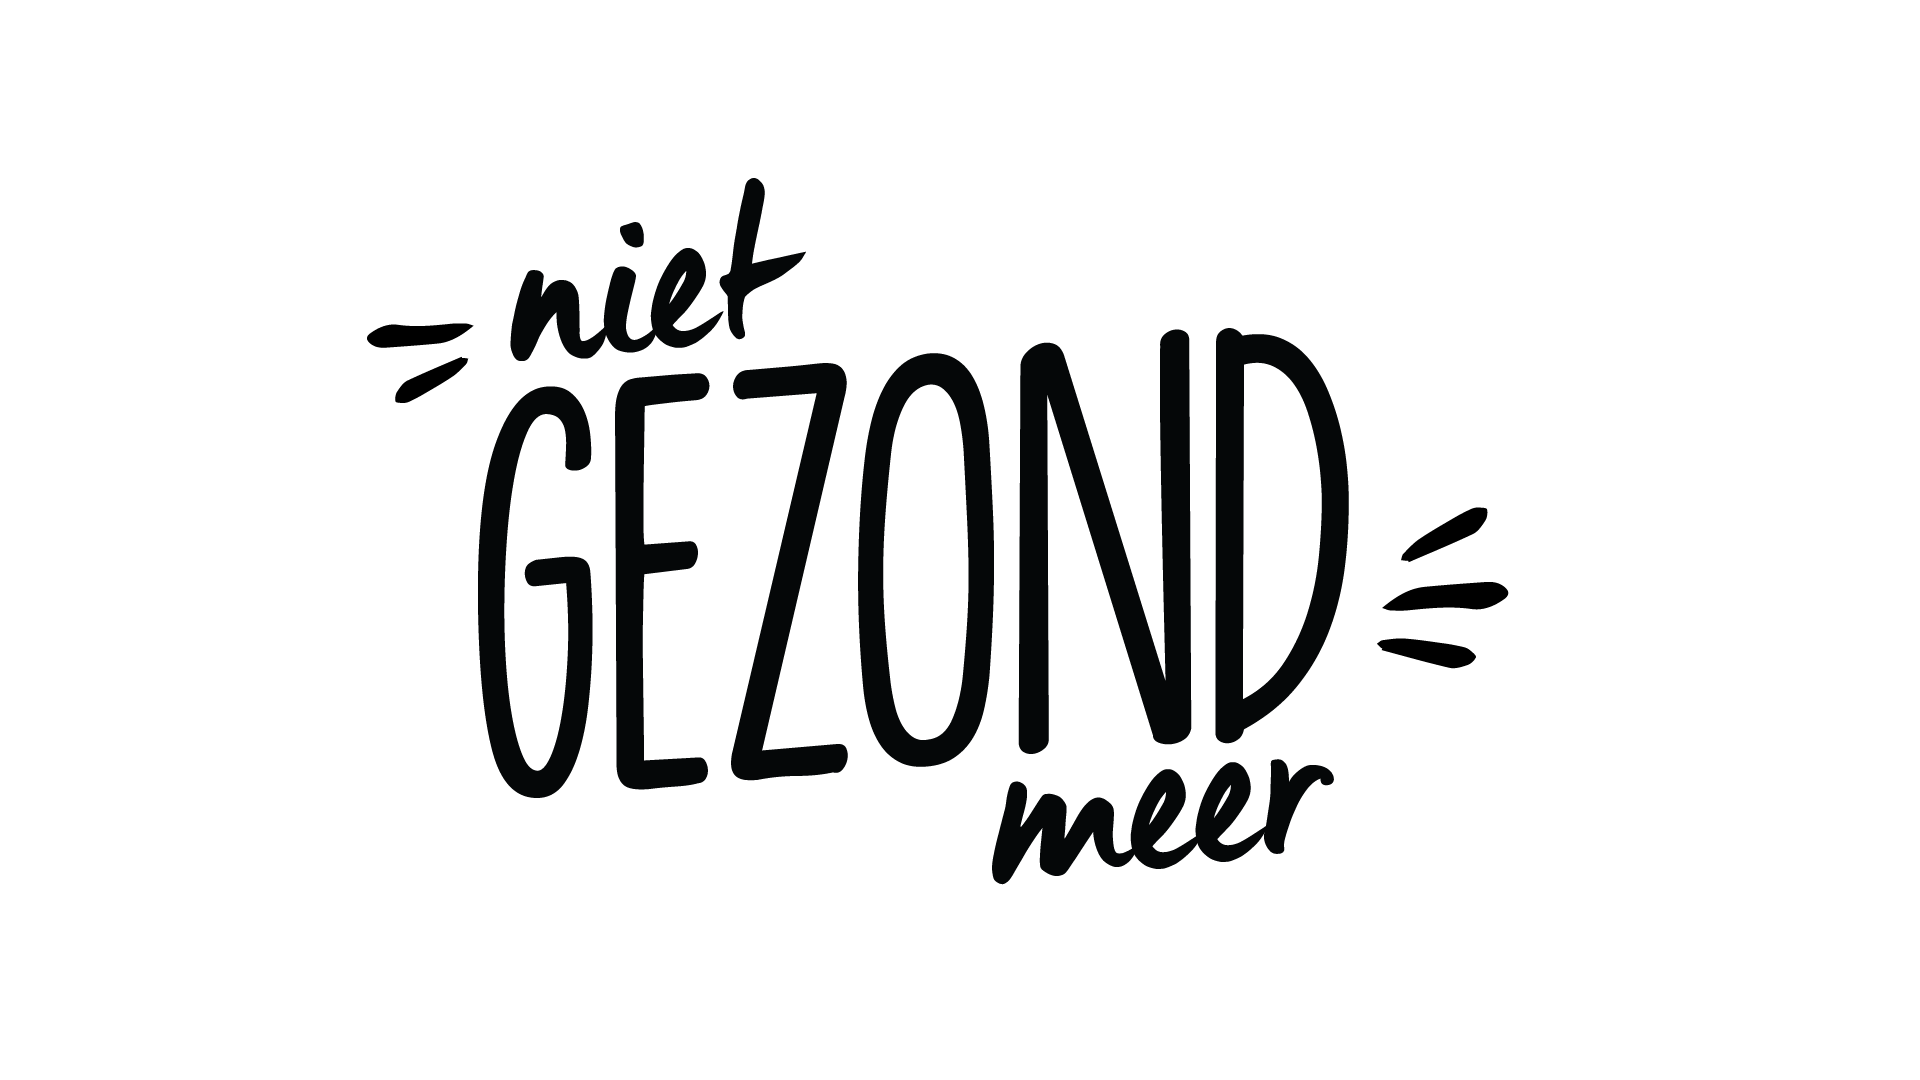 NGM-logo-mandy-cobussen-jet-van-nieuwkerk-graphic-design